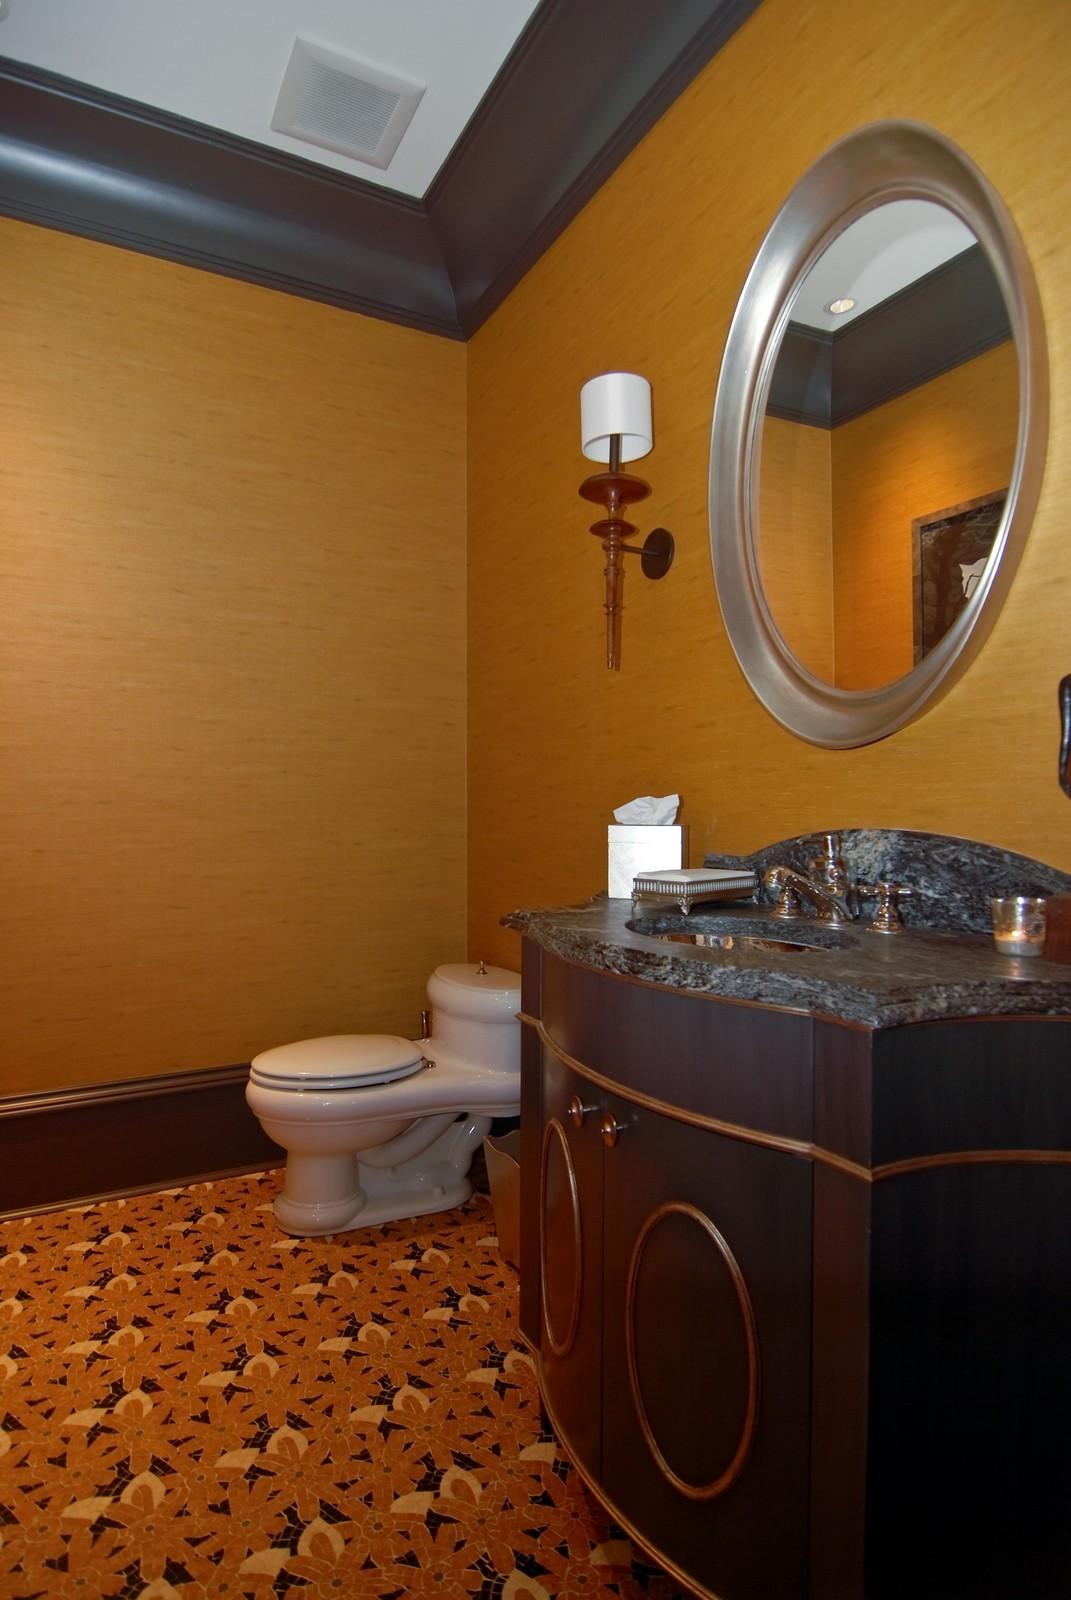 Real Estate Photography - 729 N Kingsbury, Chicago, IL, 60654 - Half Bath